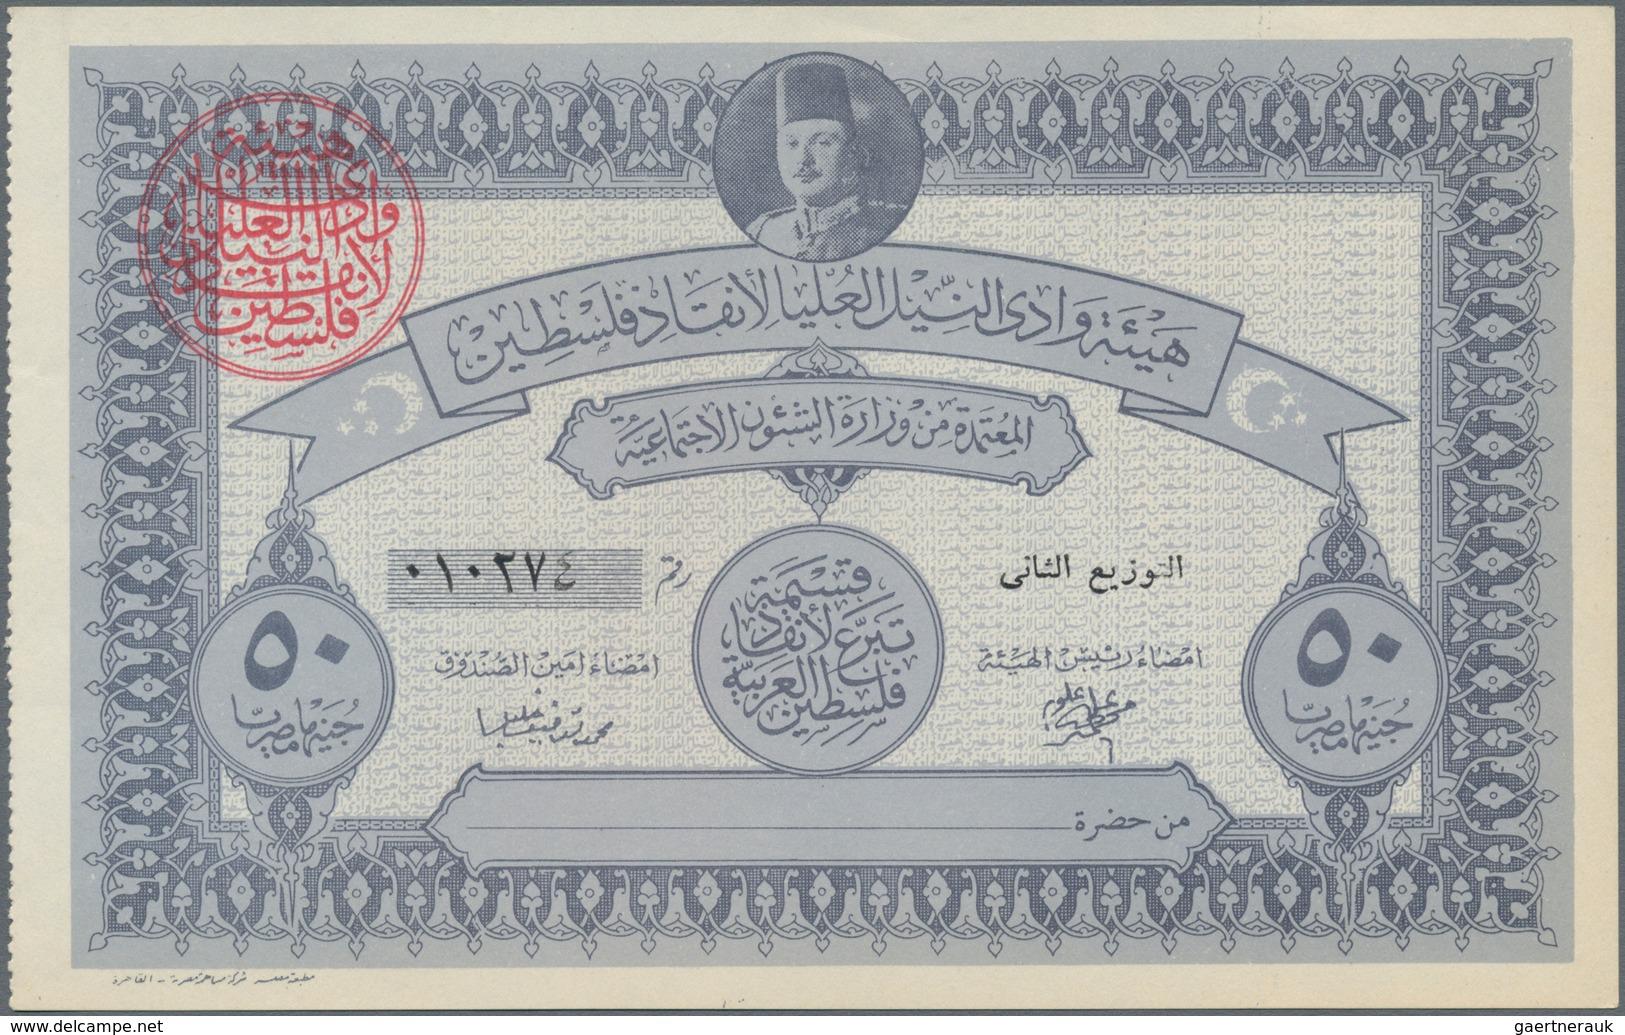 Palestine / Palästina: Set With 6 Palestine Donation Bonds With 5, 10, 2x 50 And 2x 100 Pounds, ND, - Banknotes